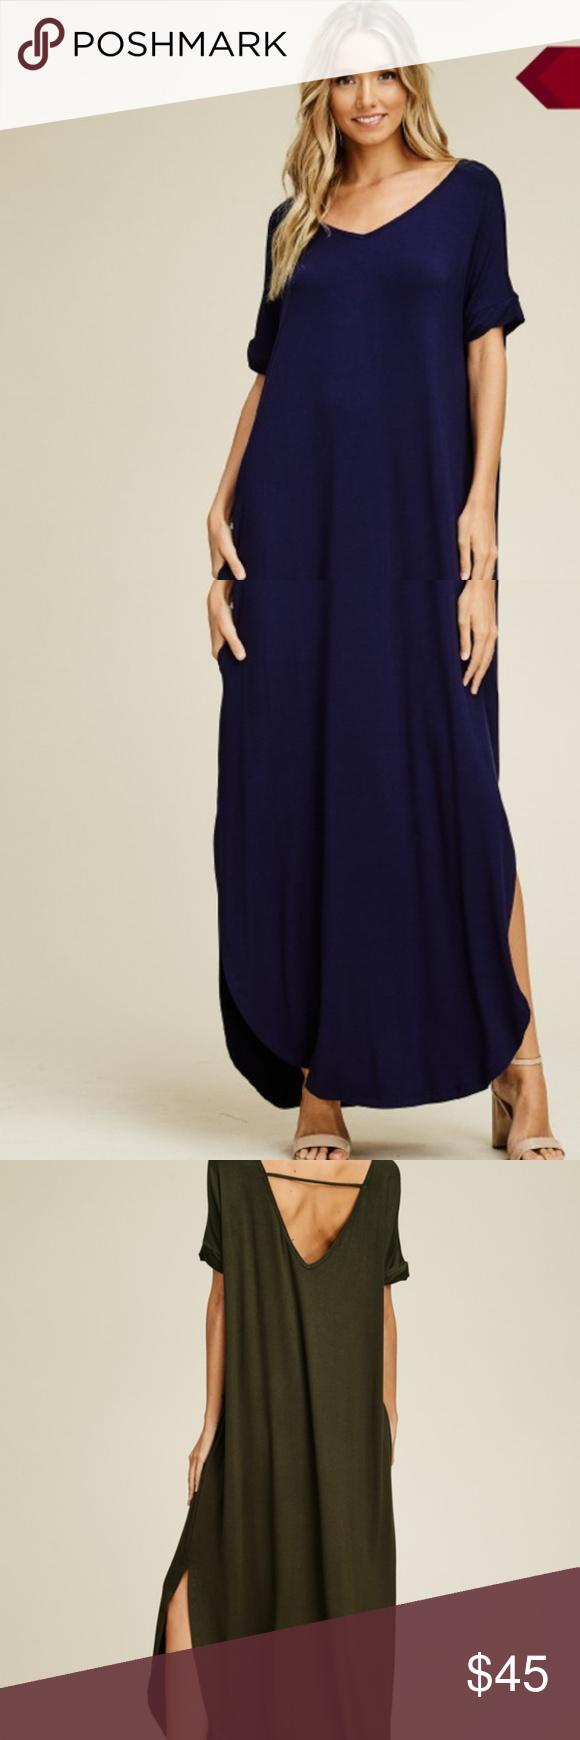 Annabelle Plus Size Maxi Dress Nwt Last One 3x Plus Size Maxi Dresses Dresses Clothes Design [ 1740 x 580 Pixel ]